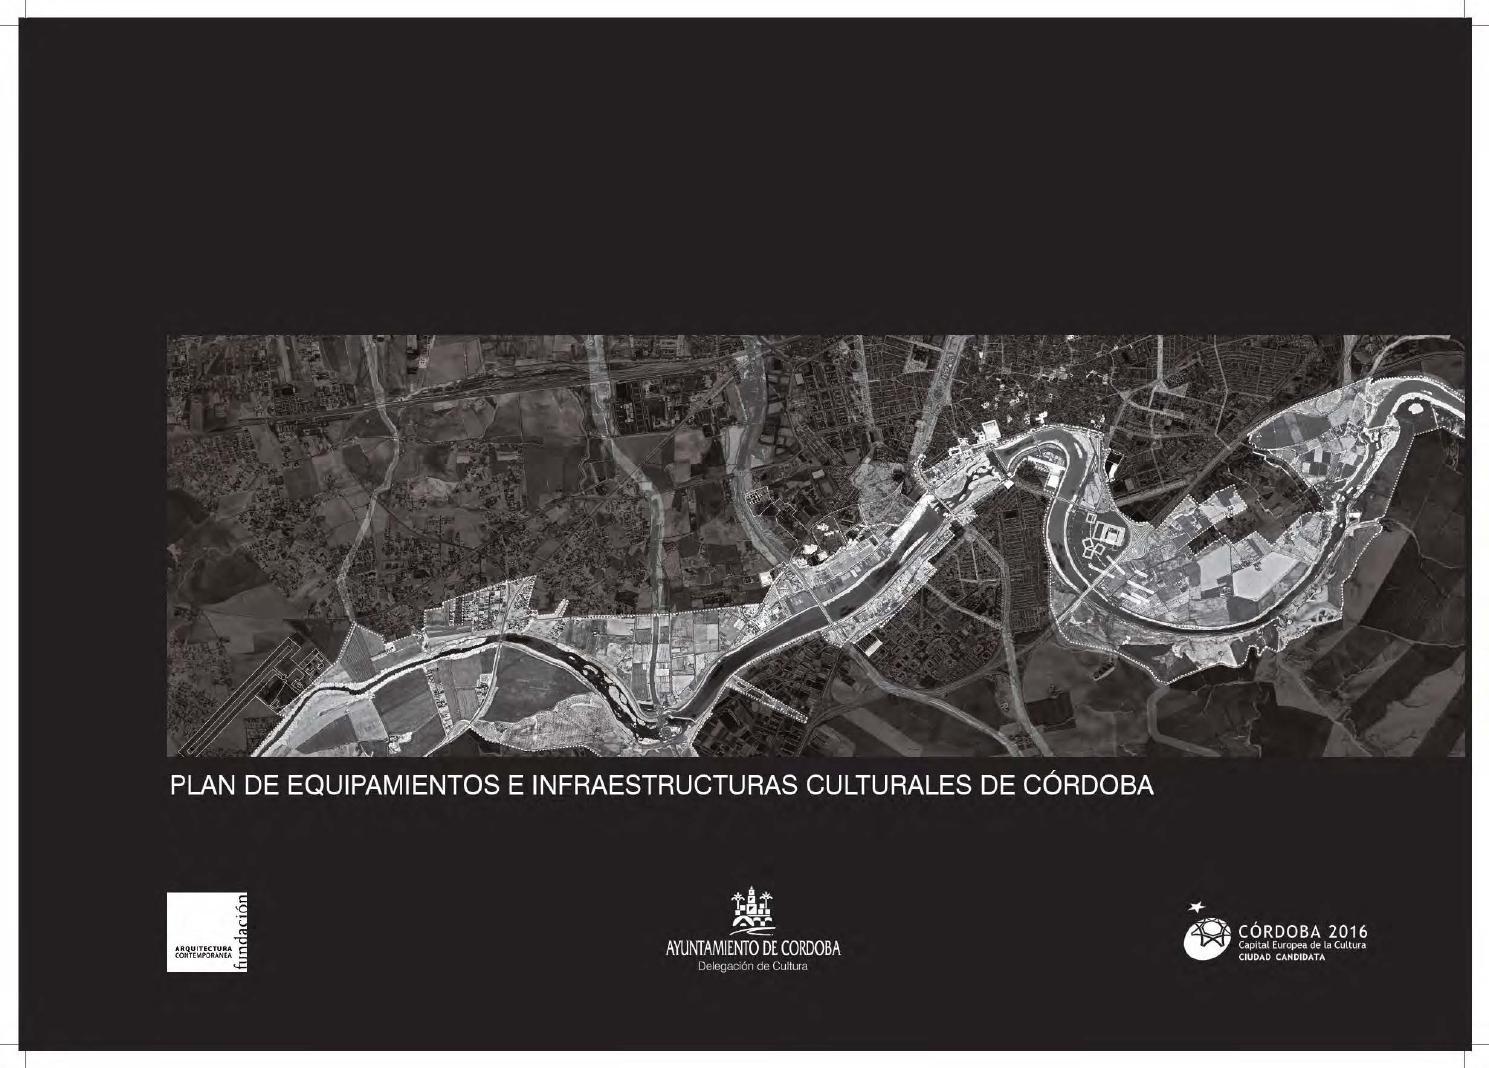 PLAN DE EQUIPAMIENTOS E INFRAESTRUCTURAS CULTURALES DE CÓRDOBA by Fundación  Arquitectura Contemporánea - issuu 2d35c88302be